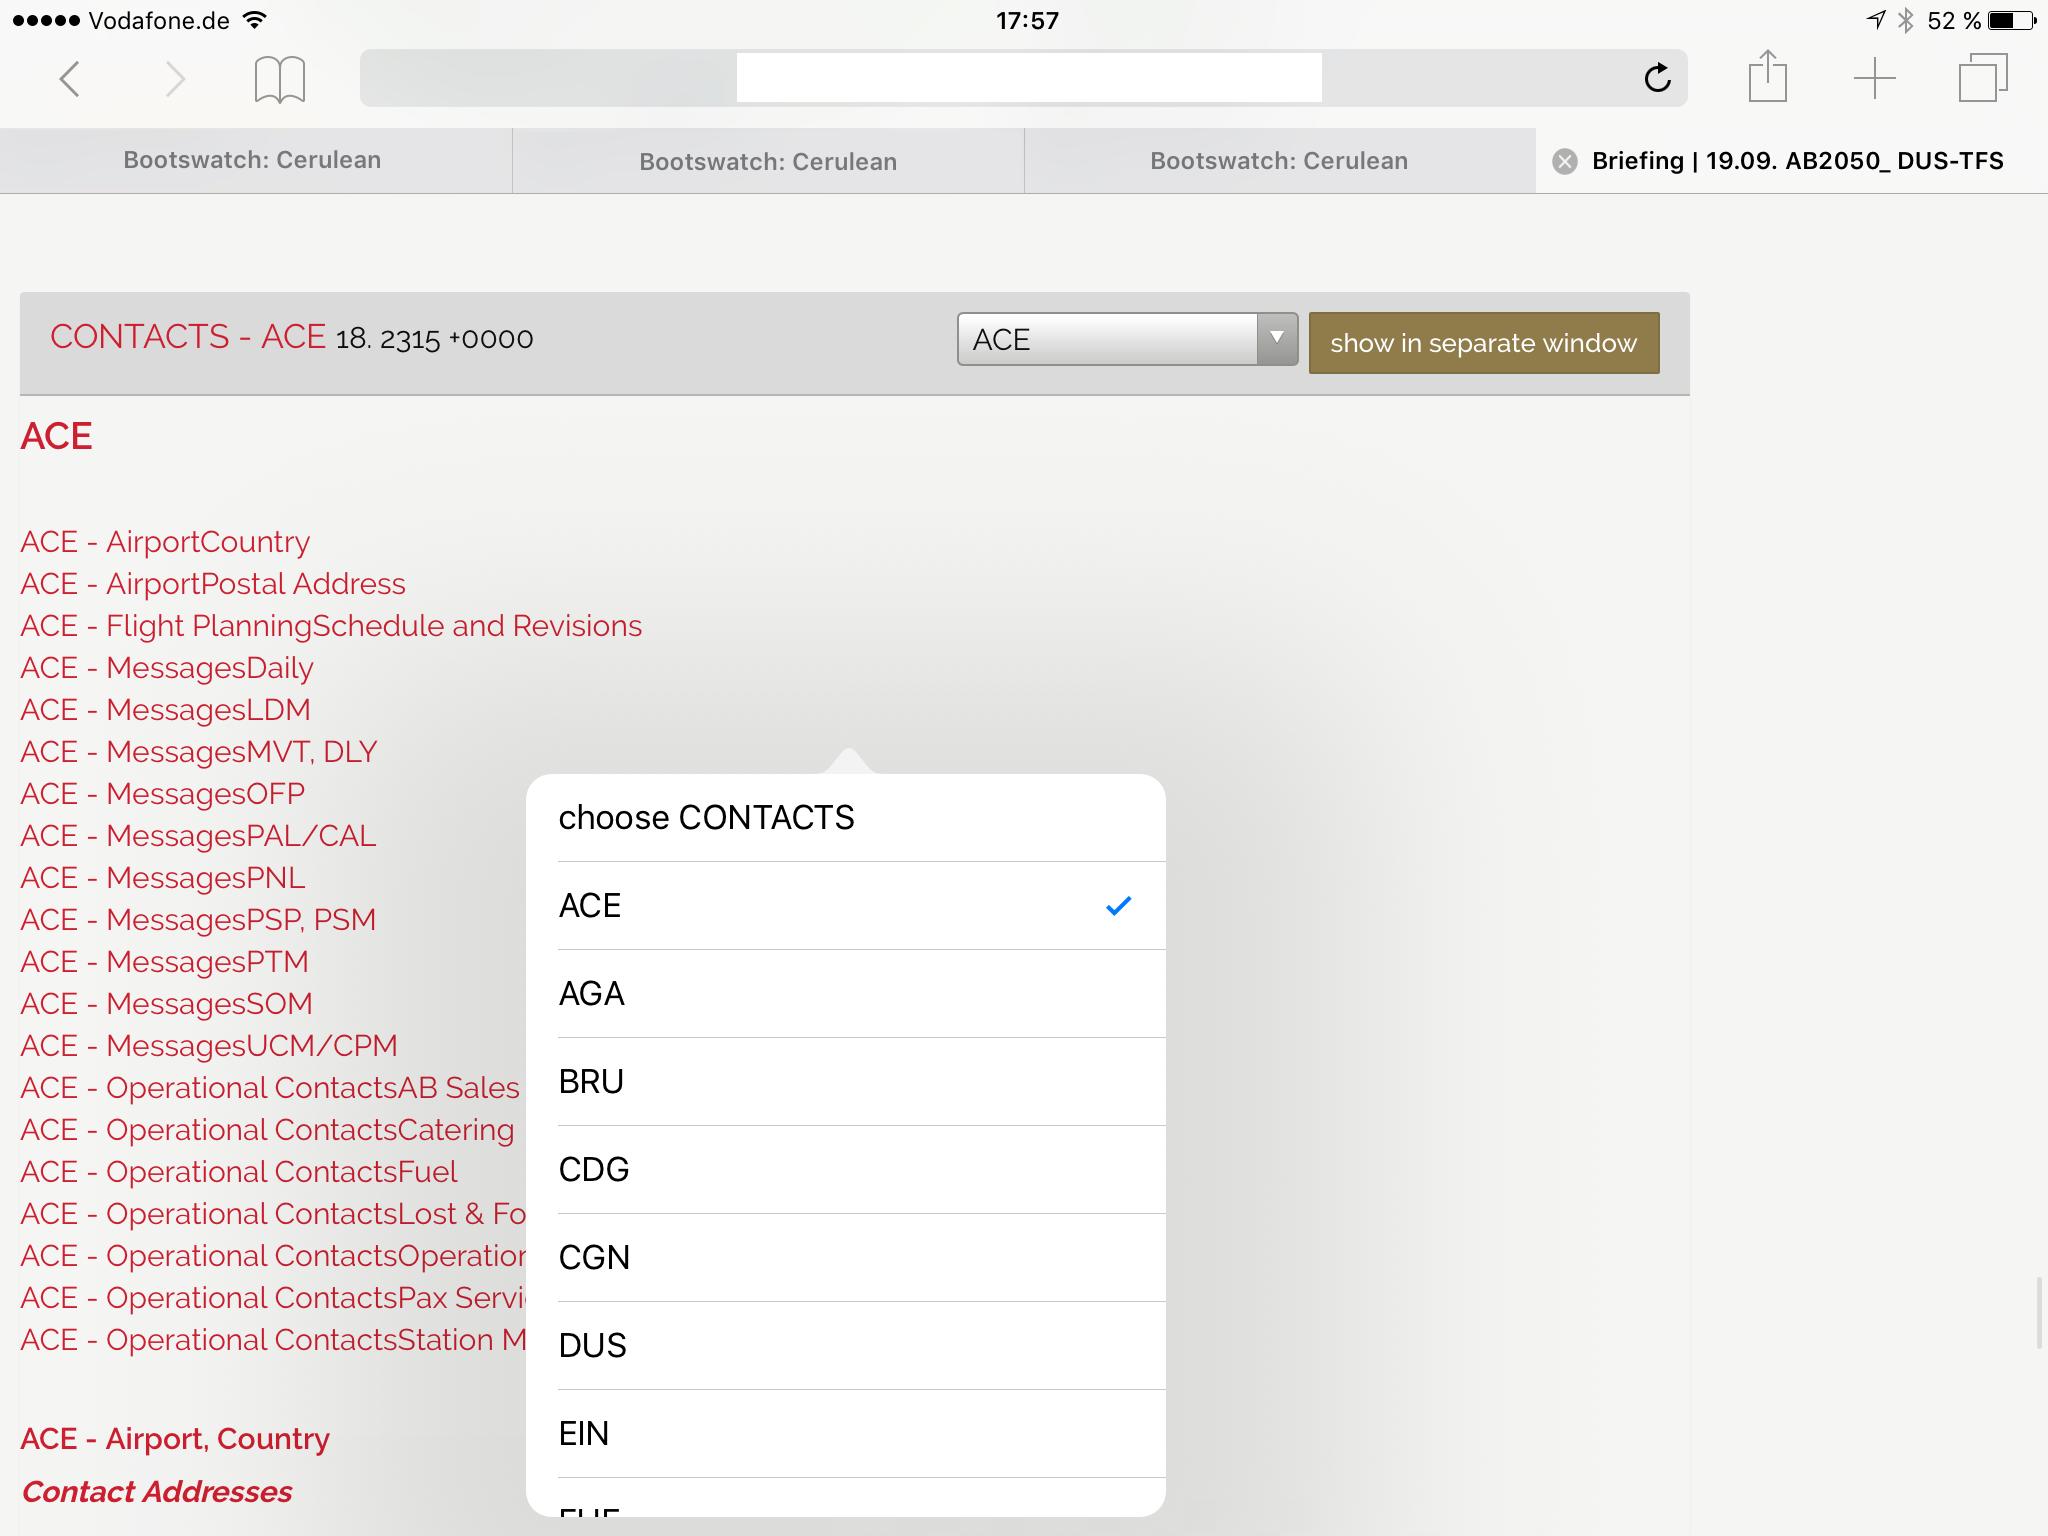 web brf misplaced select helper